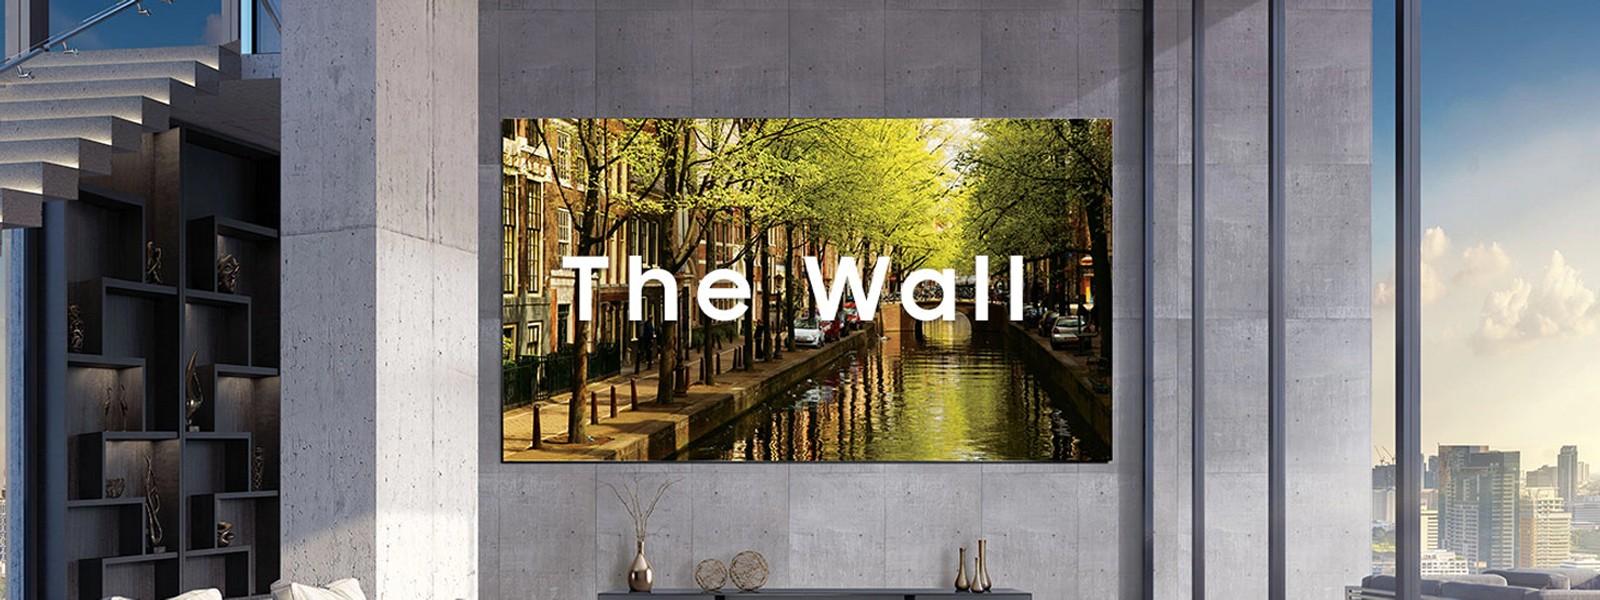 samsung wall microled